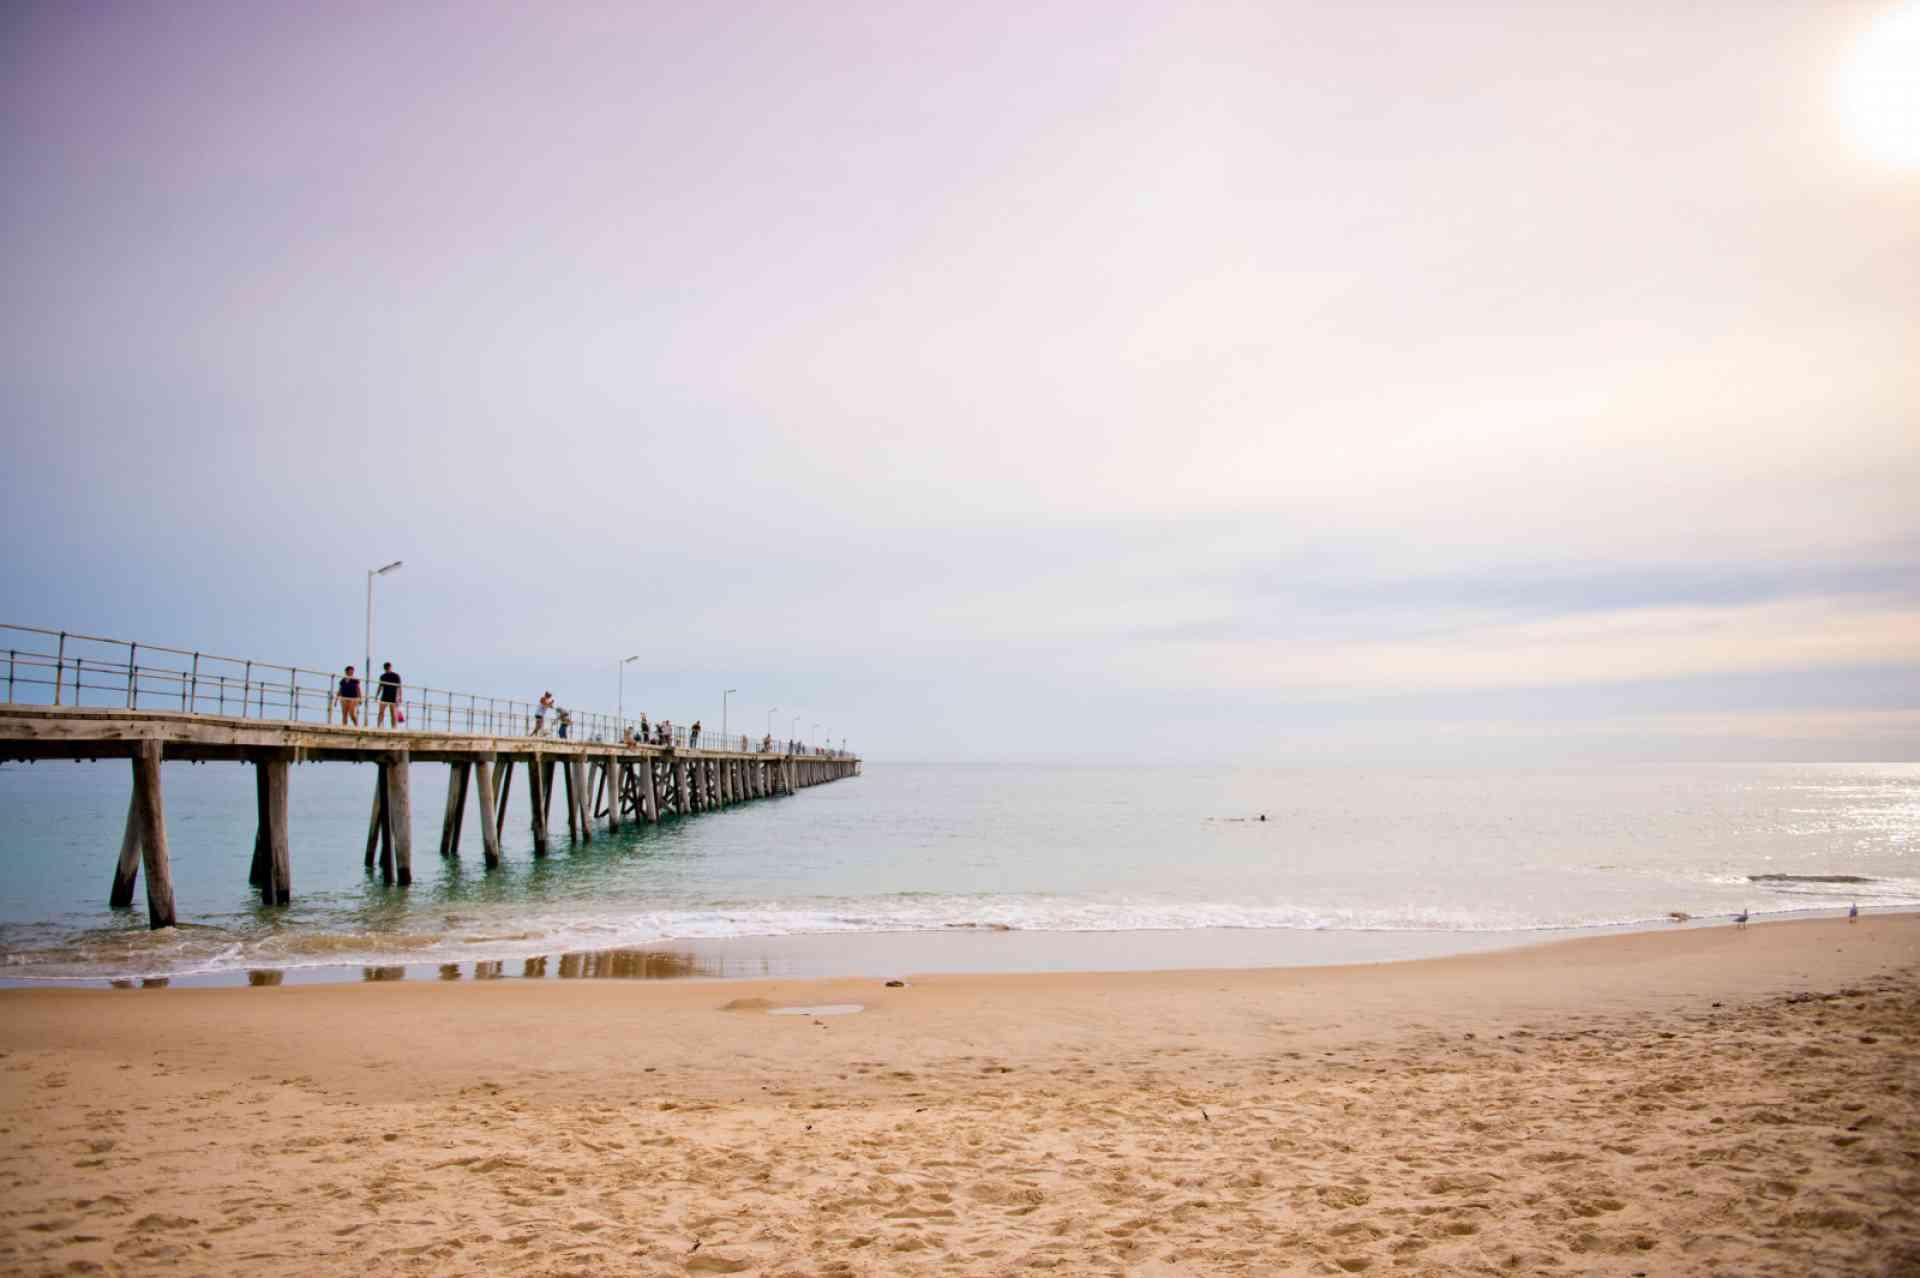 Port Noarlunga Jetty by Adam Bruzzone, South Australian Tourism Commission